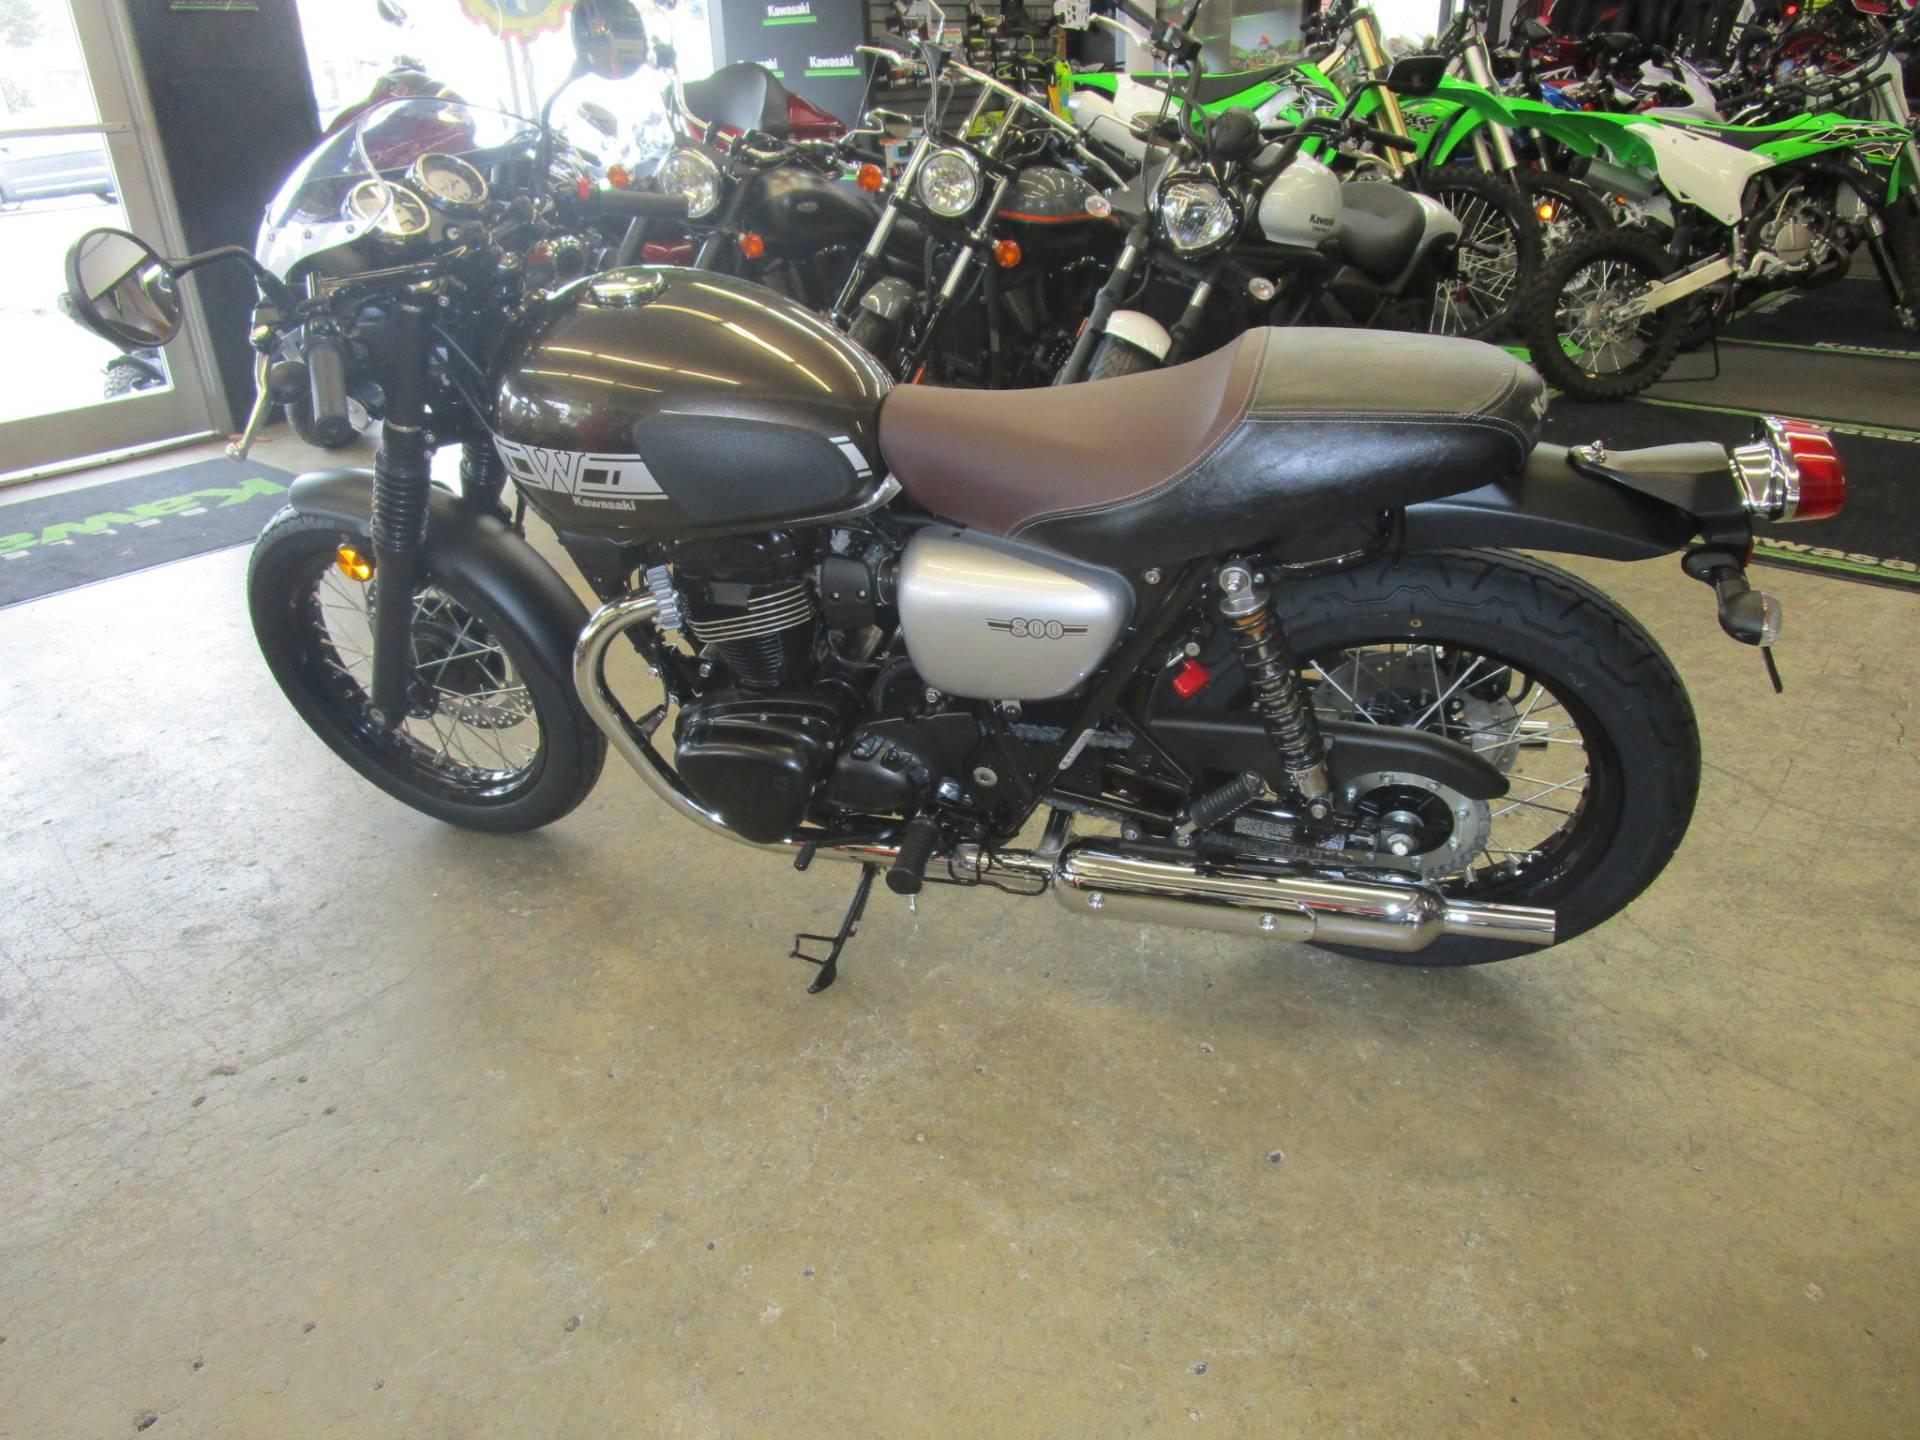 New 2019 Kawasaki W800 Cafe Motorcycles In Bellevue Wa Stock